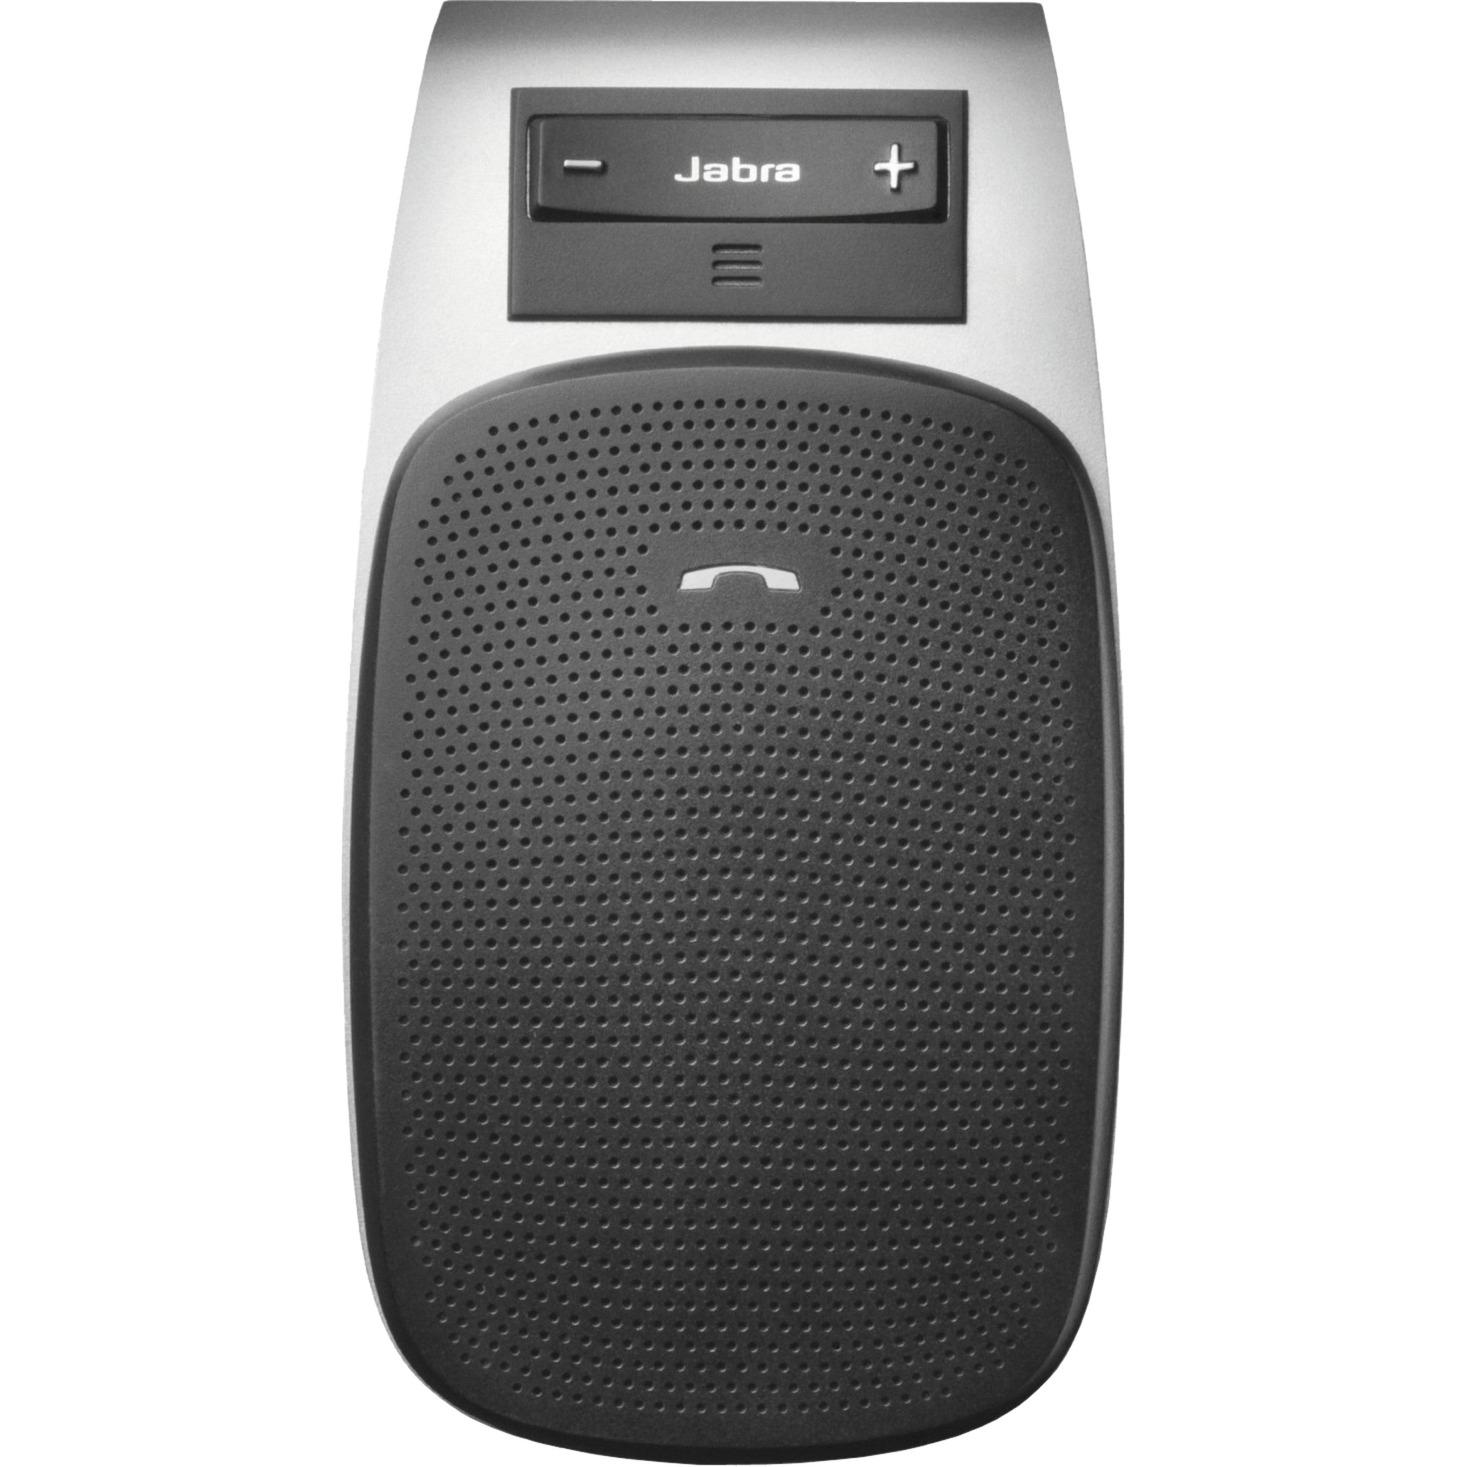 Drive altavoz Universal Negro Bluetooth, Auriculares con micrófono